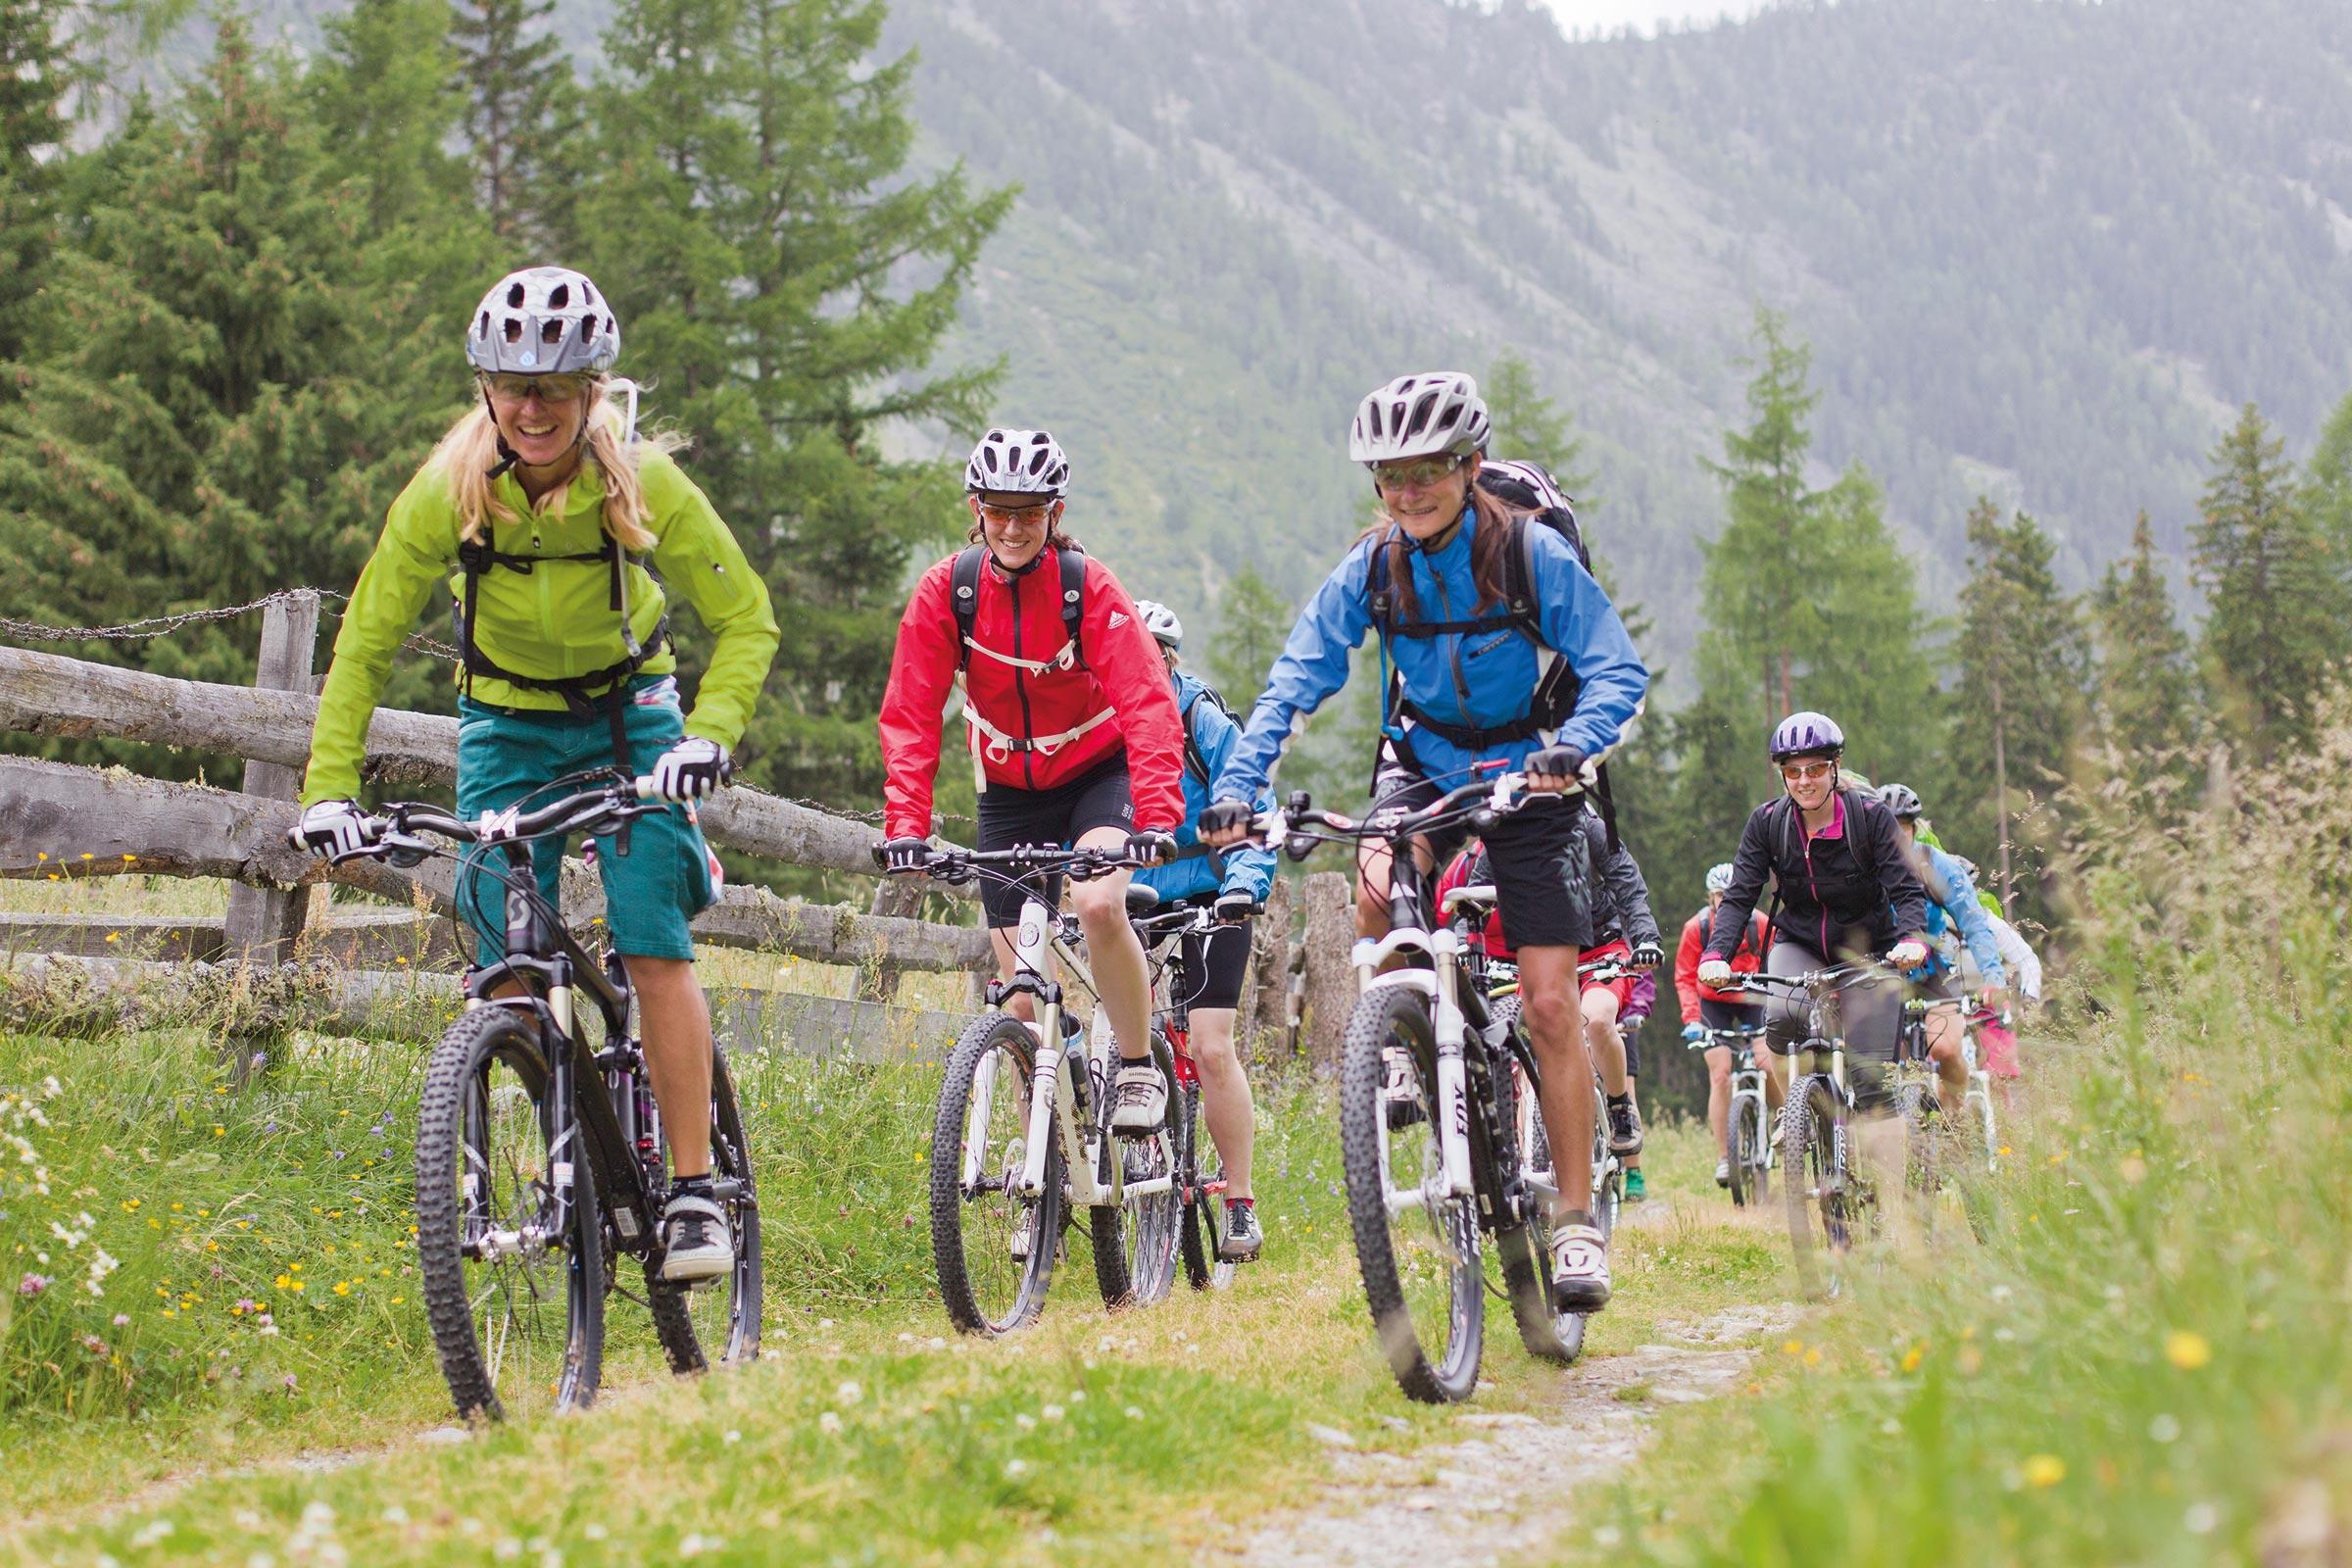 Gruppe Mountainbiker unterwegs - Ötztaler Stromstoß E-Bike Festival